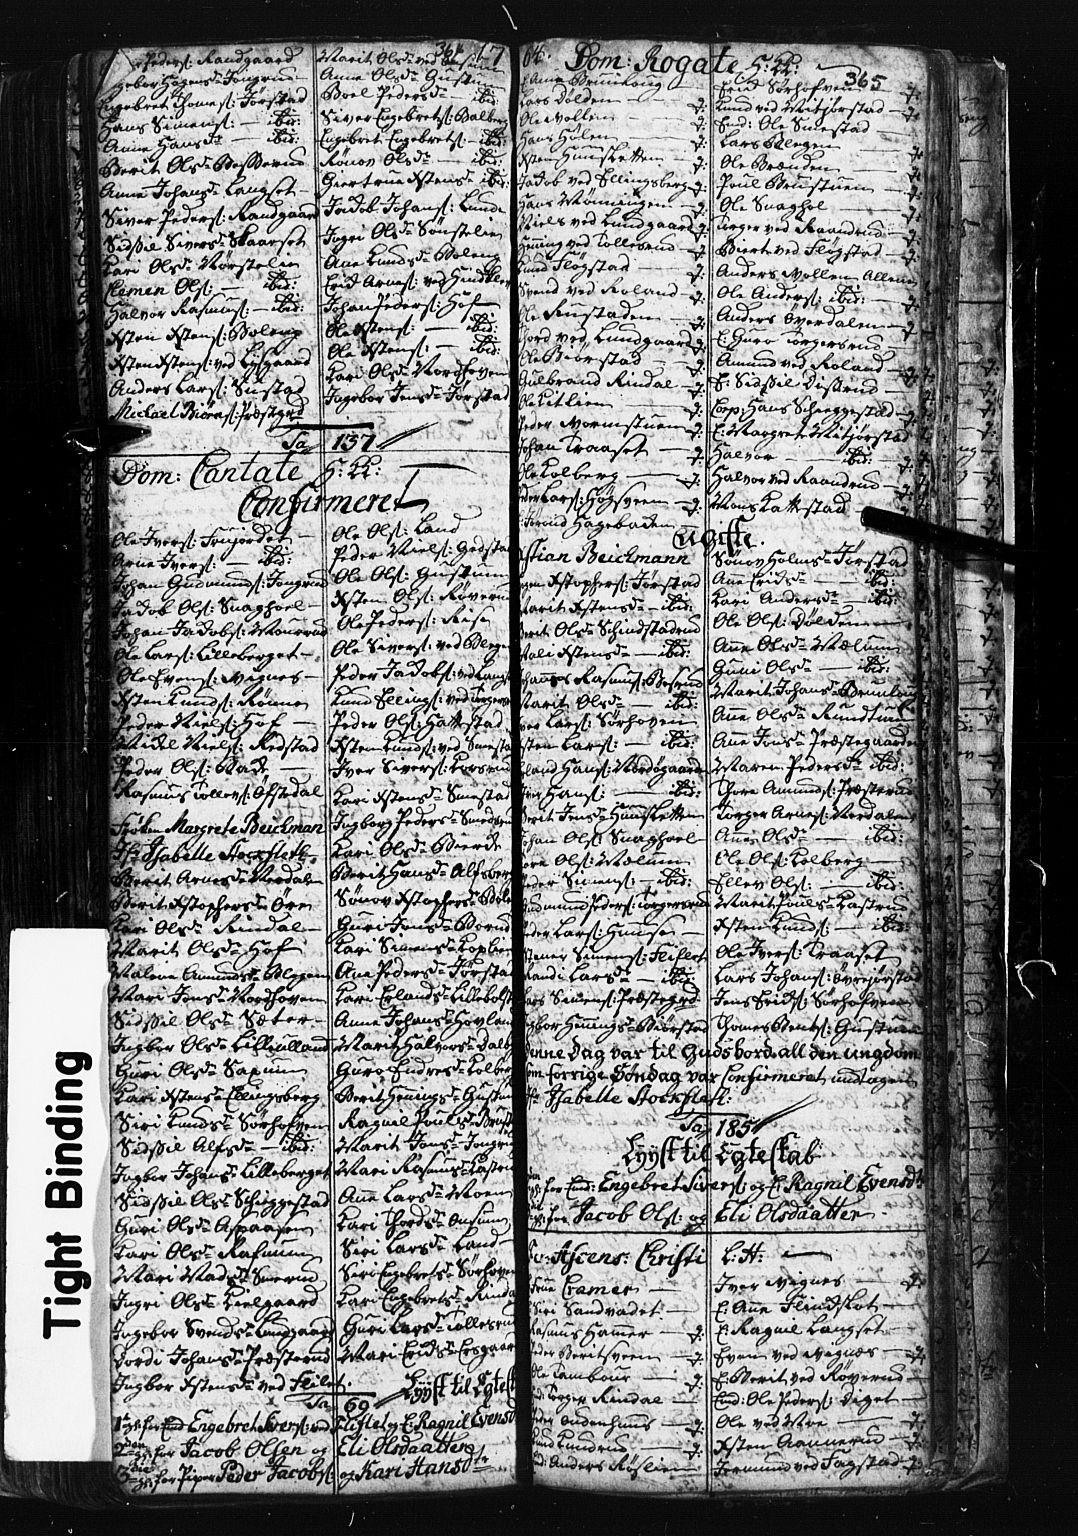 SAH, Fåberg prestekontor, Klokkerbok nr. 1, 1727-1767, s. 364-365